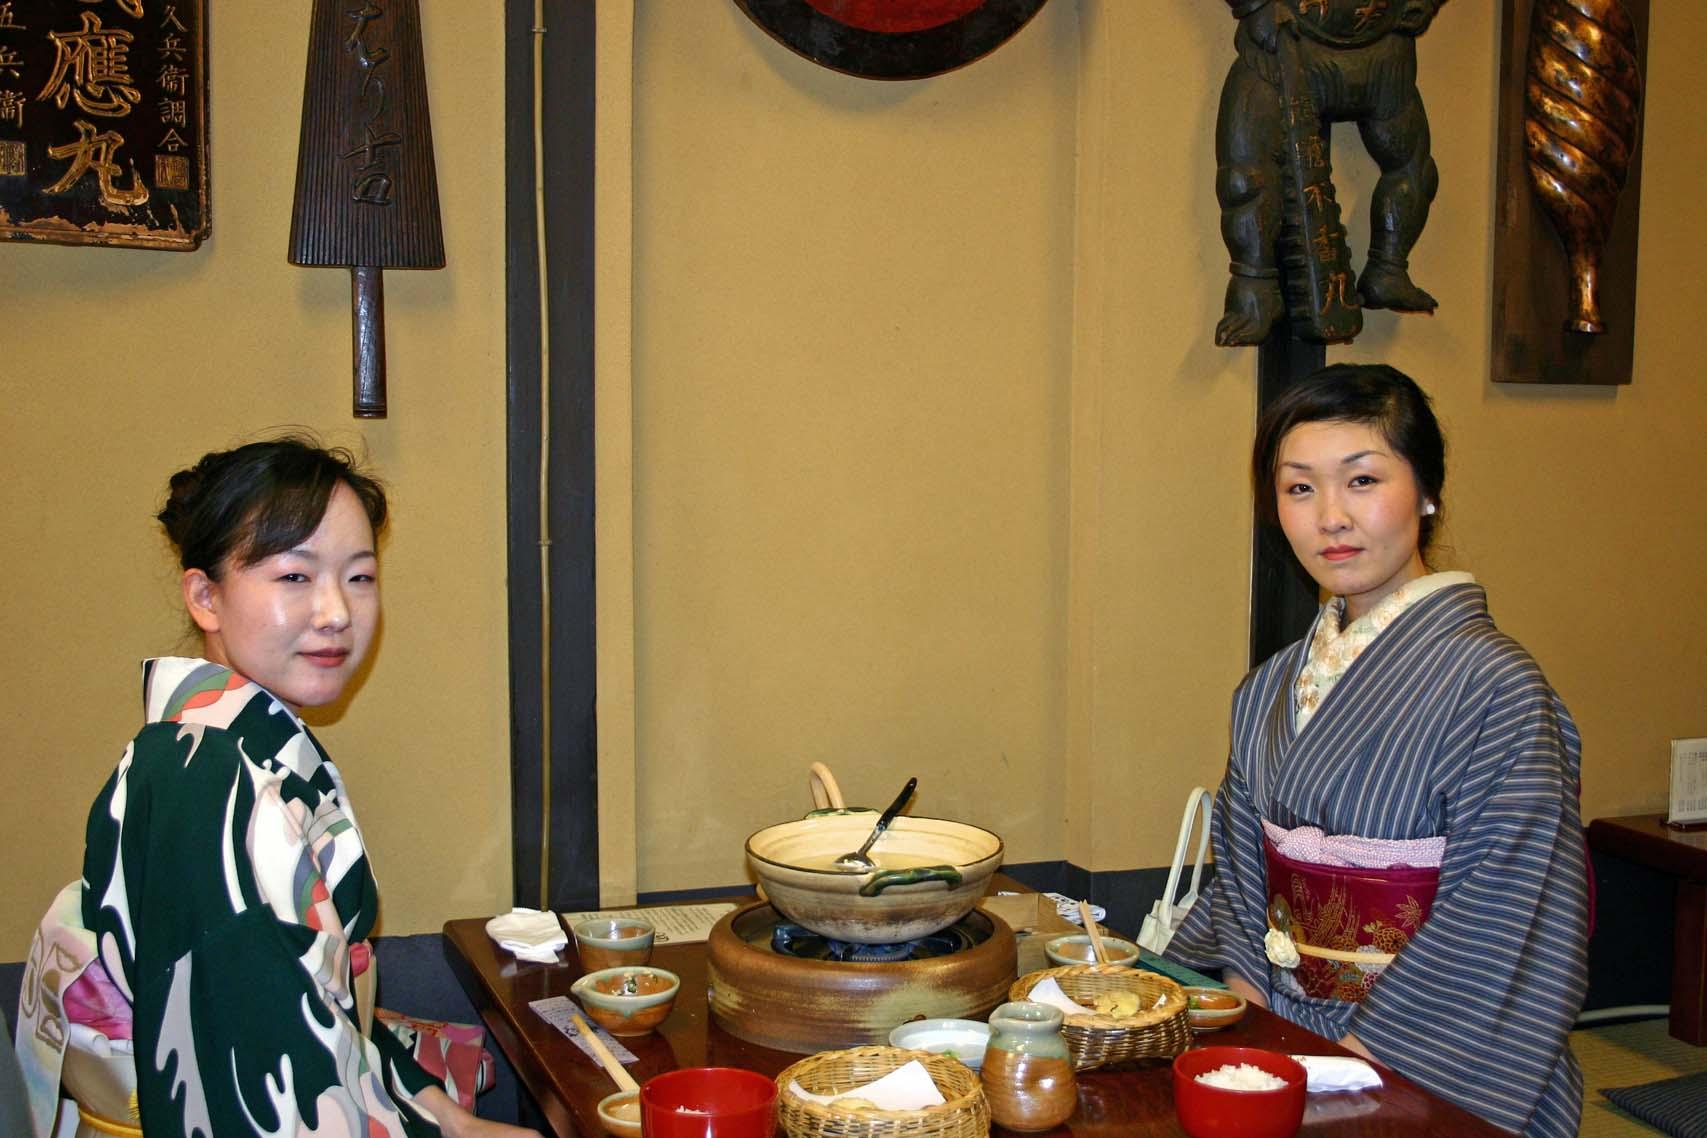 44南禅寺順正の京美人